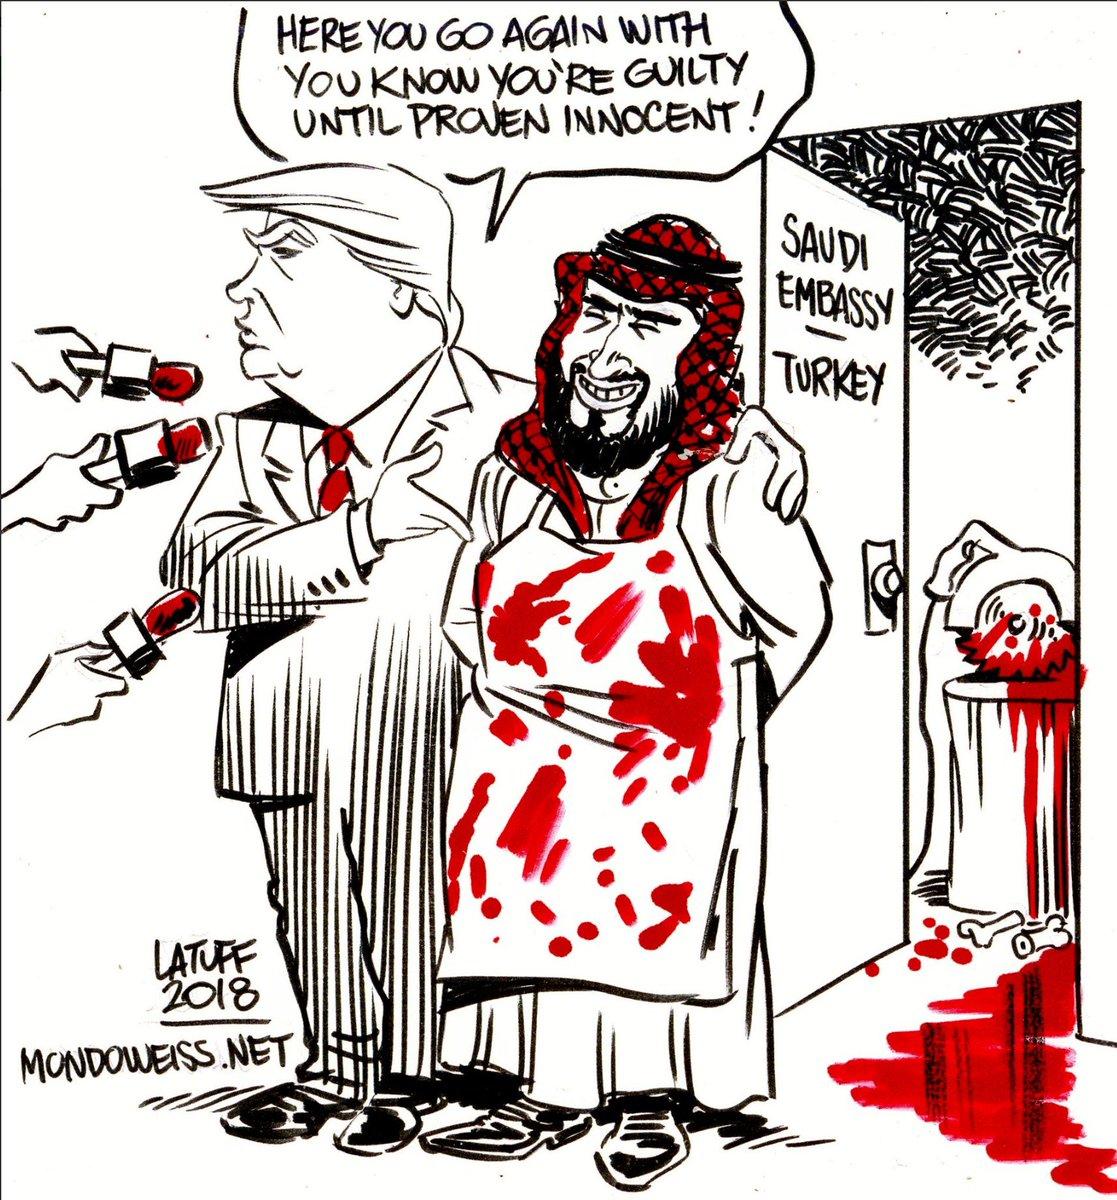 #Khashoogi     x      Latuff  #FelizJueves #Filosofía #ReferéndumParaLaRepública #Portada #Portadas #EnPortada<br>http://pic.twitter.com/FHTz7Ht9Uw